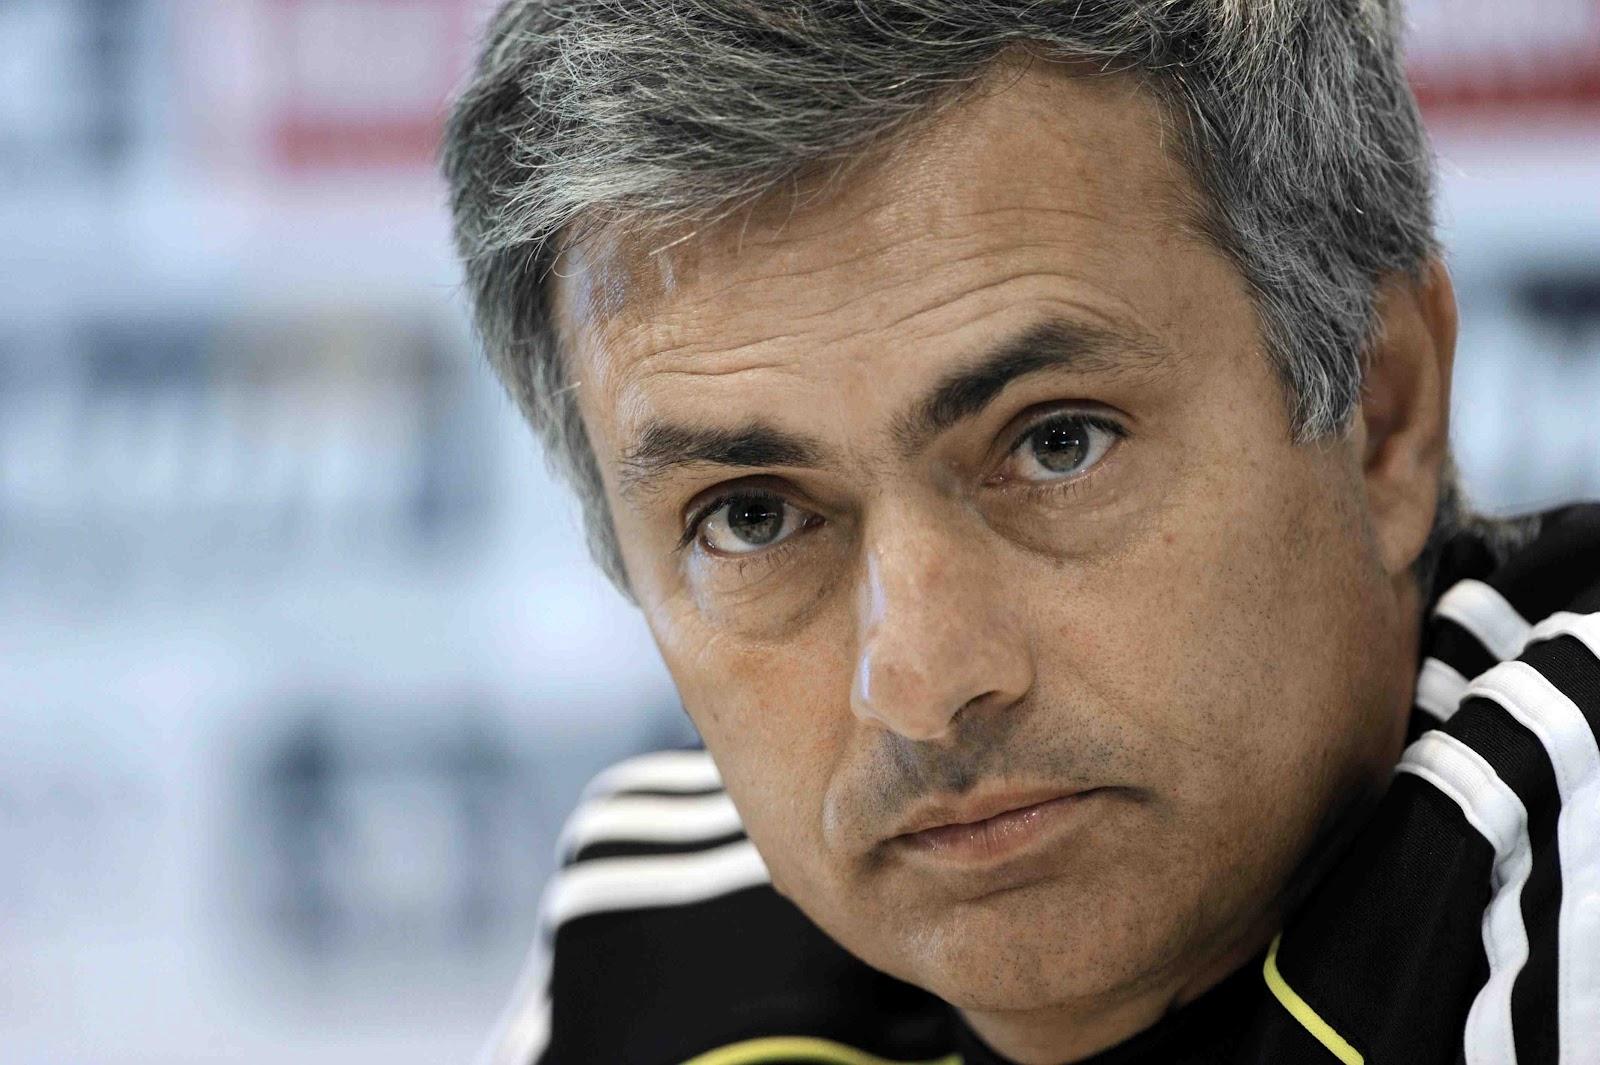 Bekas Asisten Puji Sikap Jujur Jose Mourinho